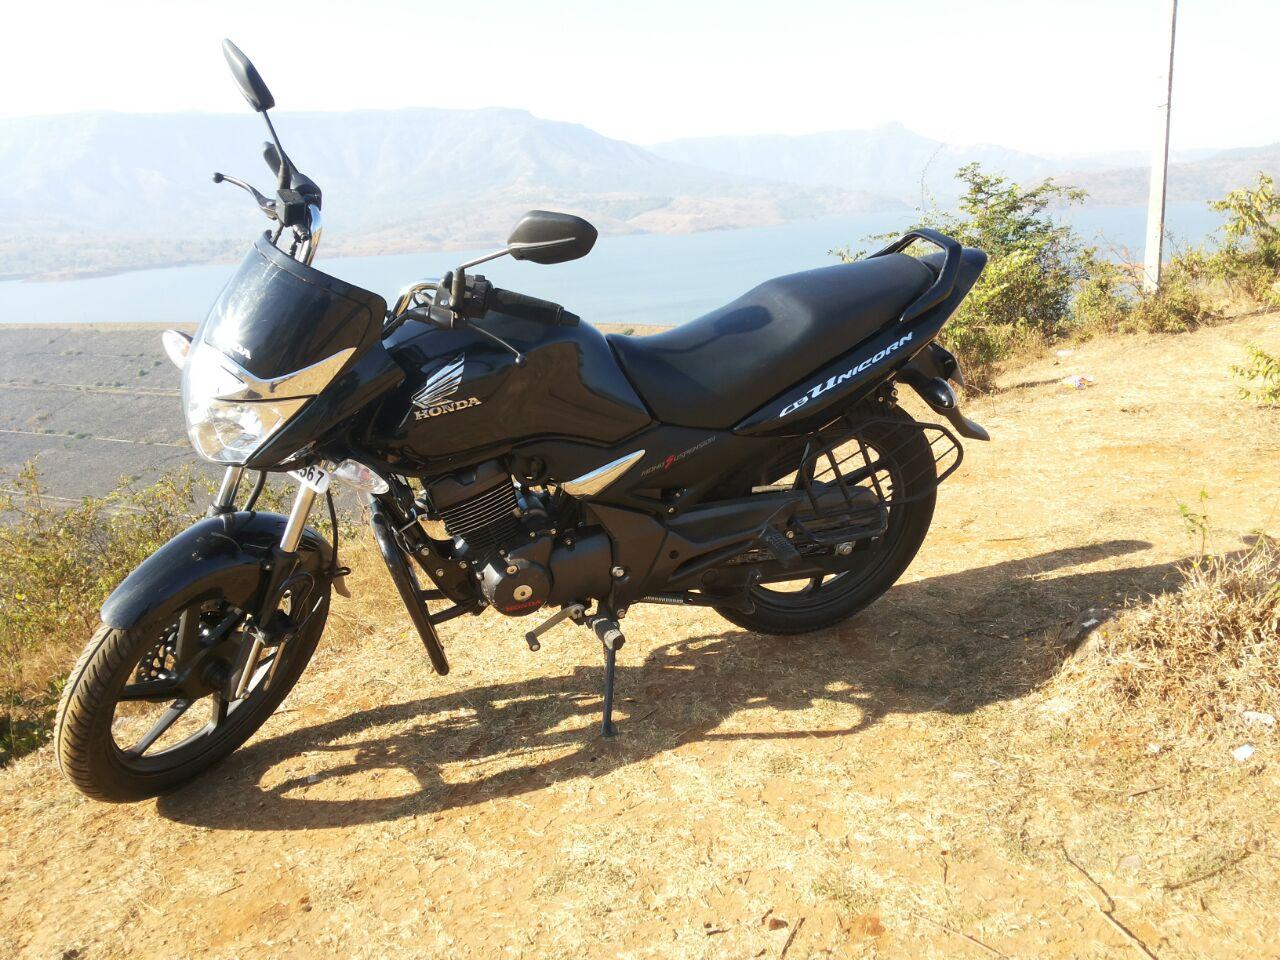 Honda Unicorn 150cc - value for Money - HONDA UNICORN 150 ...